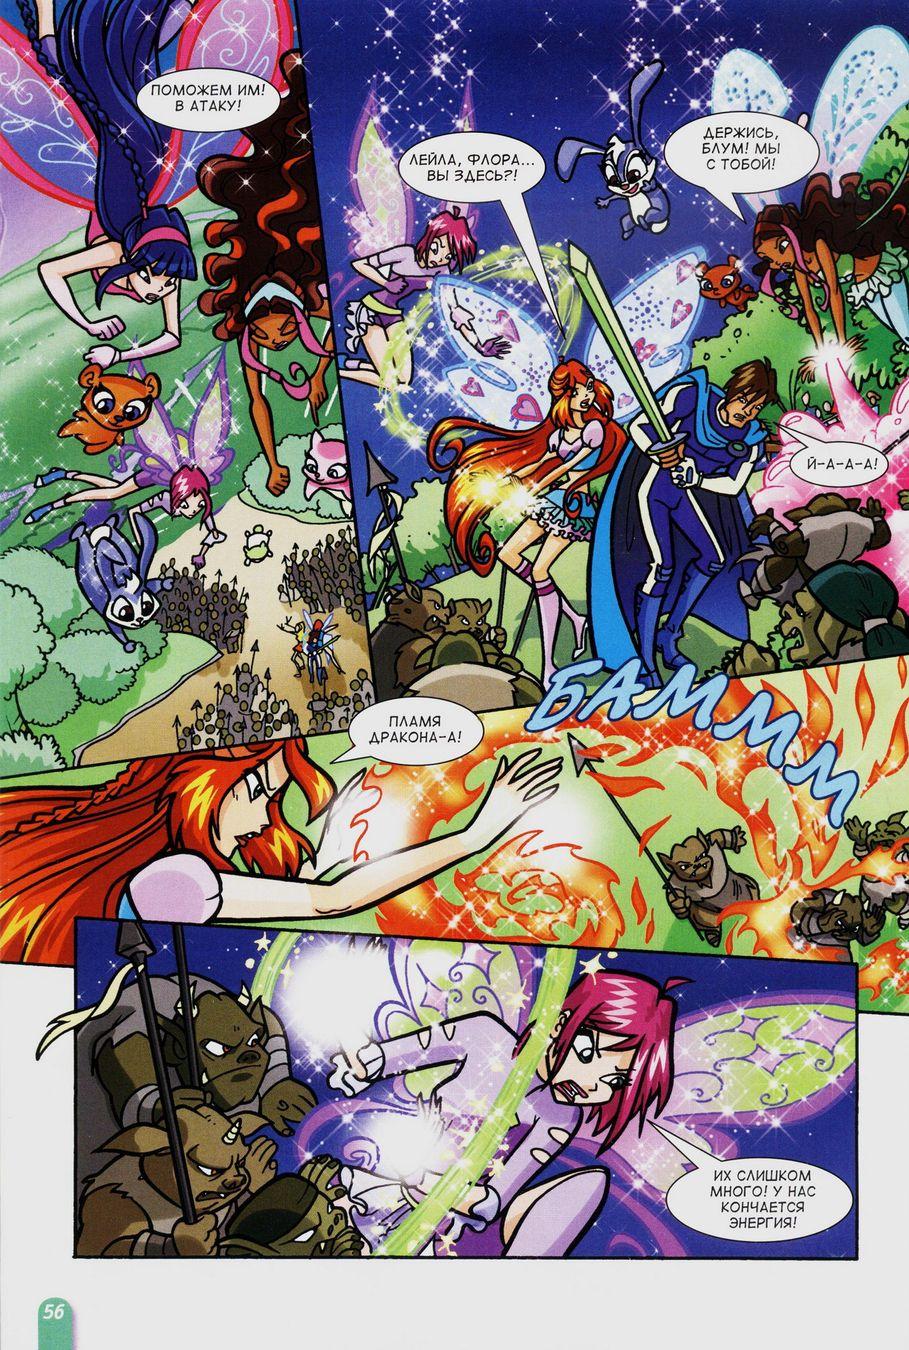 Комикс Винкс Winx - Волшебник Камуд (Журнал Винкс №6 2011) - стр. 56